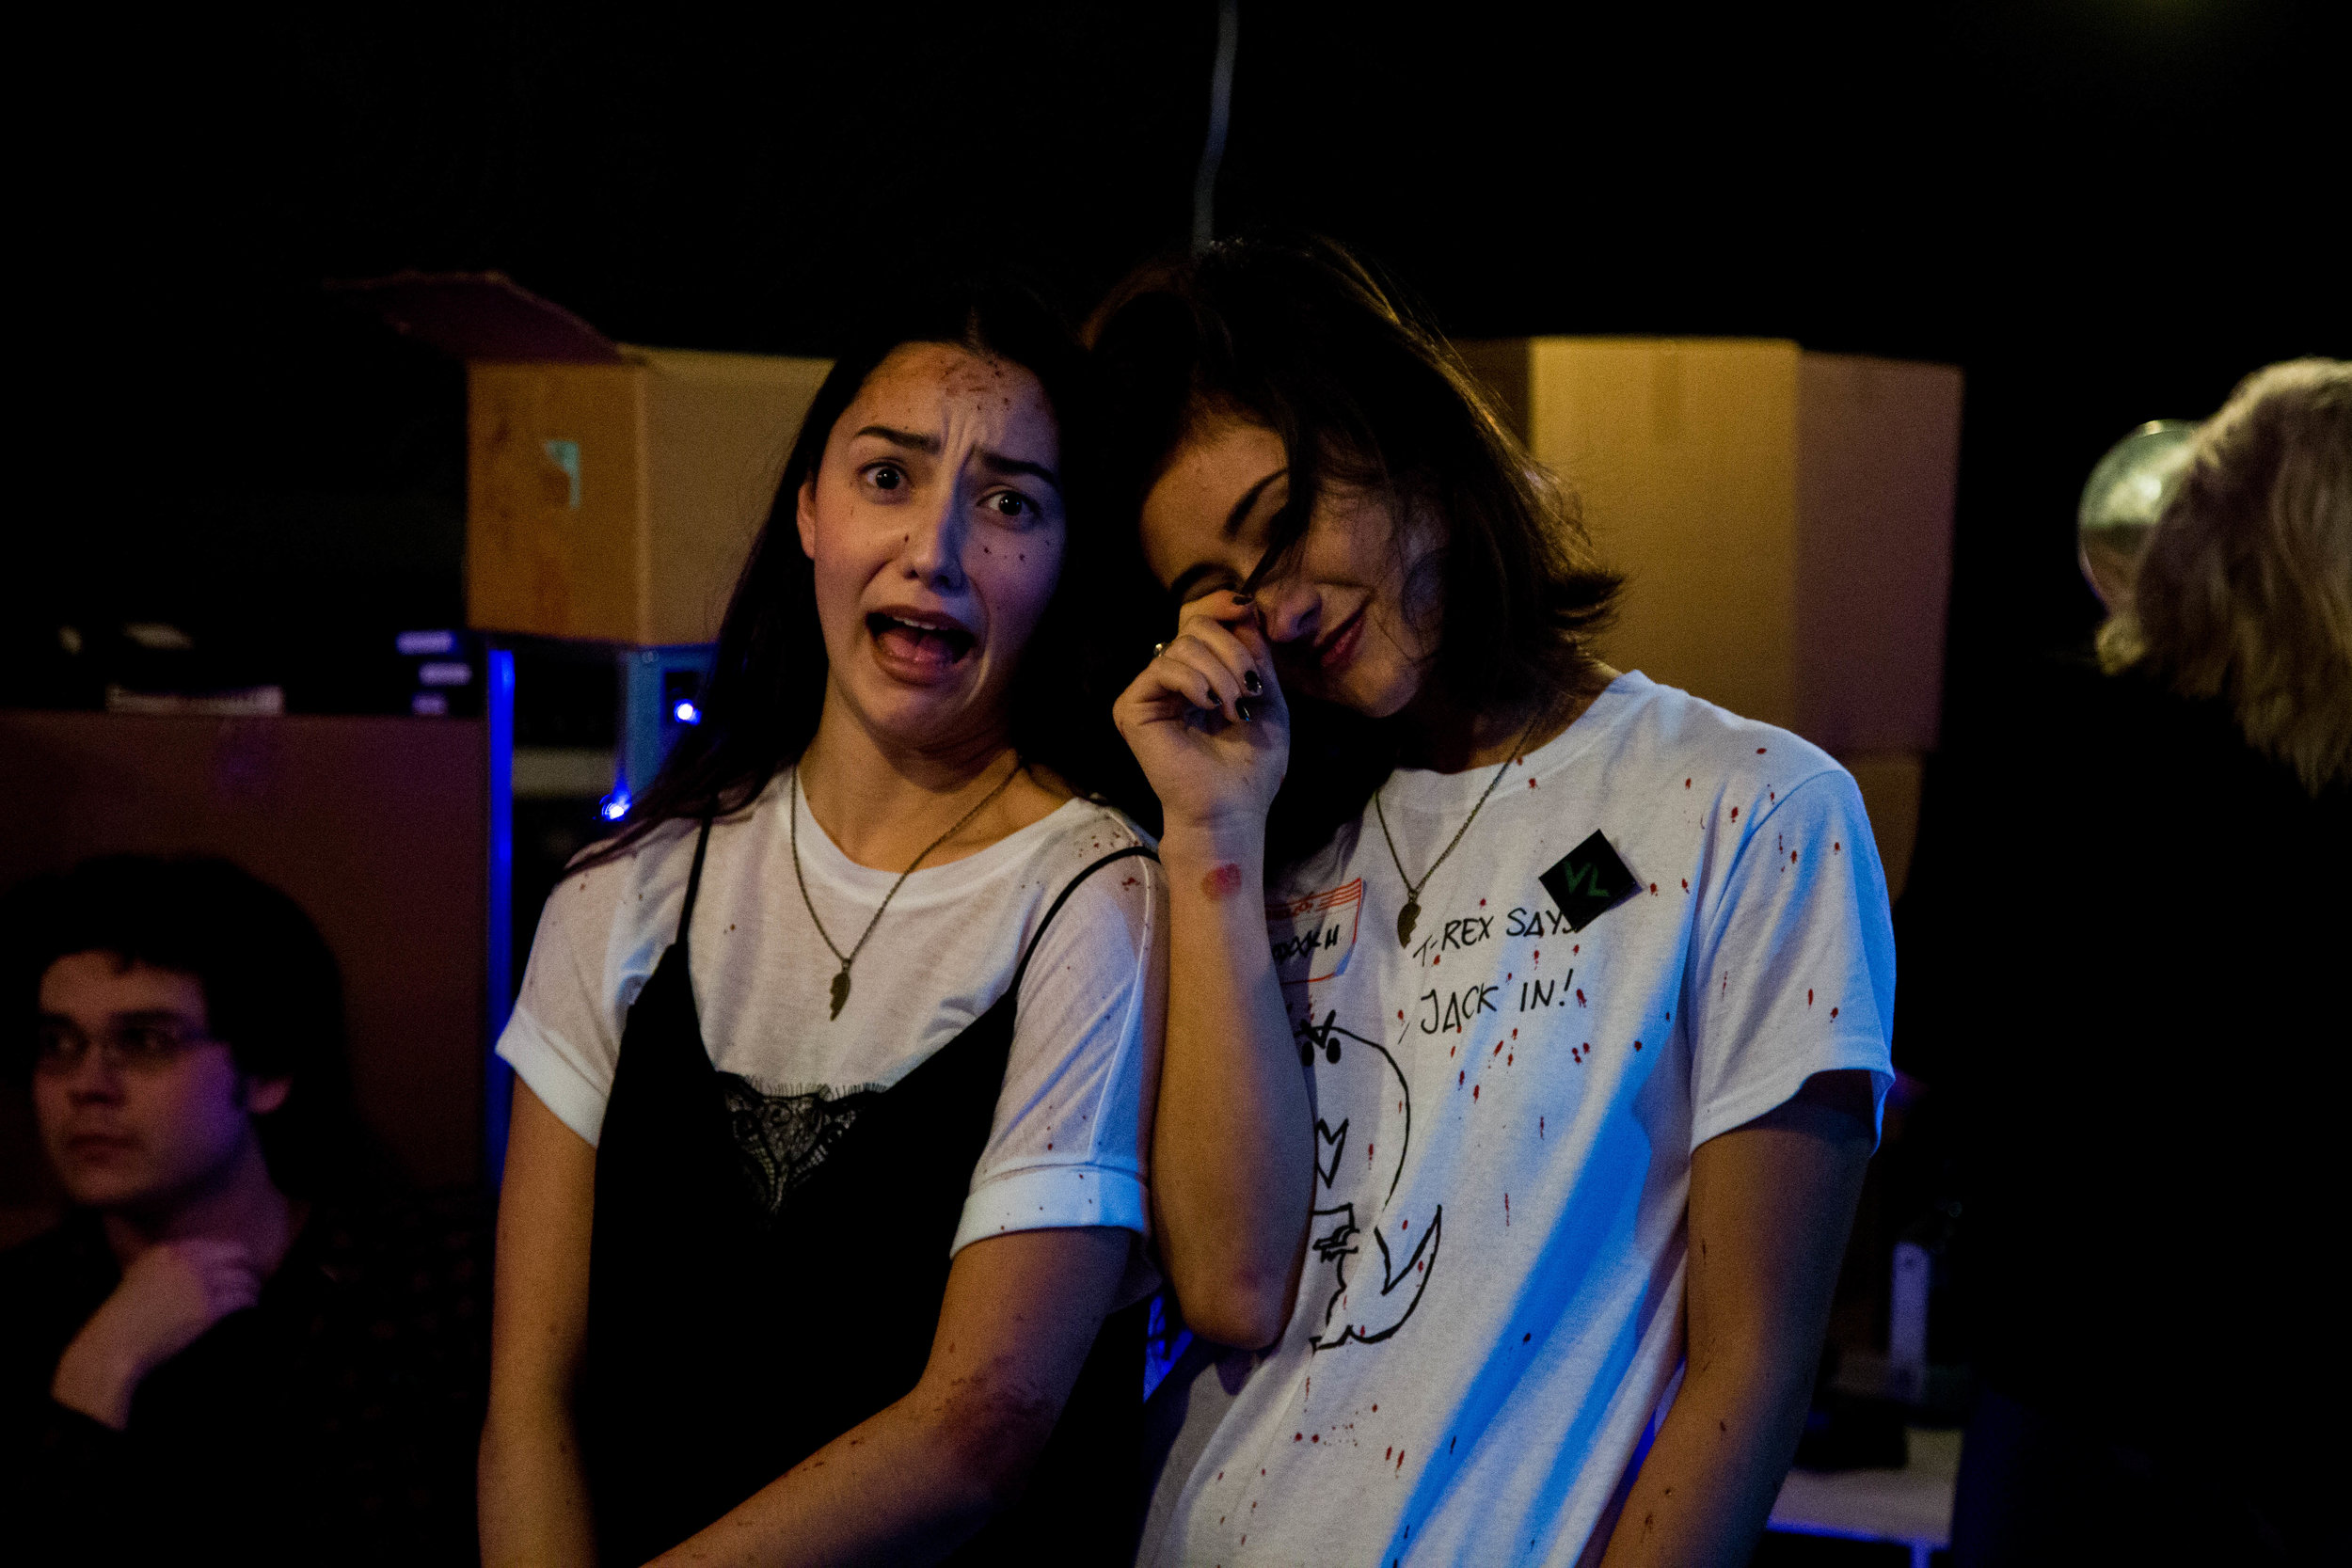 Stars Katie Hayashida and Nalani Weston Wakita fooling around on set.